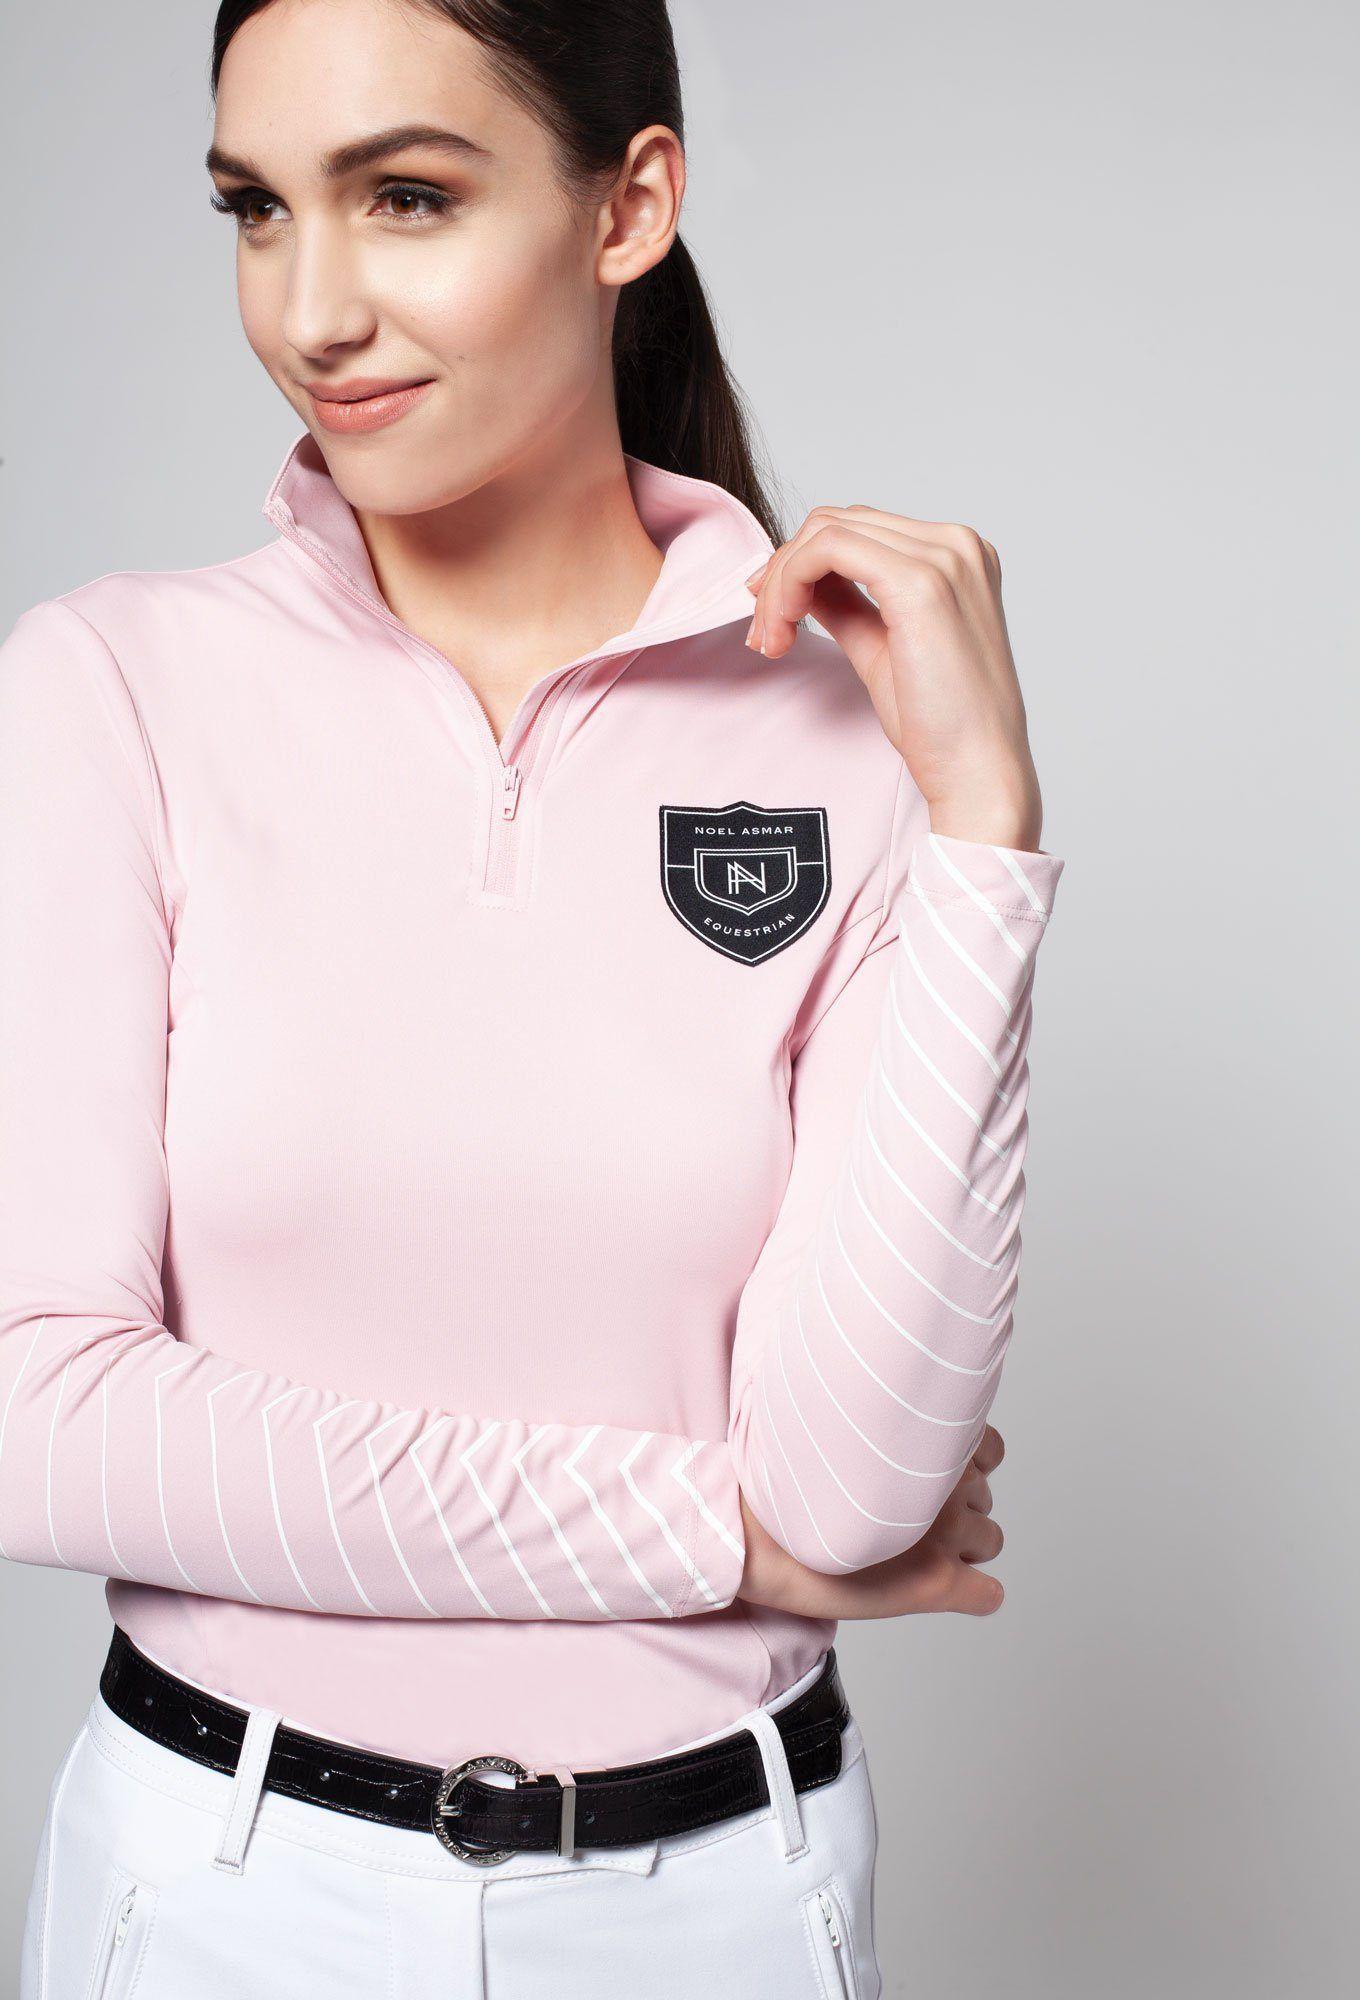 Noel Asmar Ladies Selina 1/4 Zip Sun Shirt Sports & Fitness Sports ...